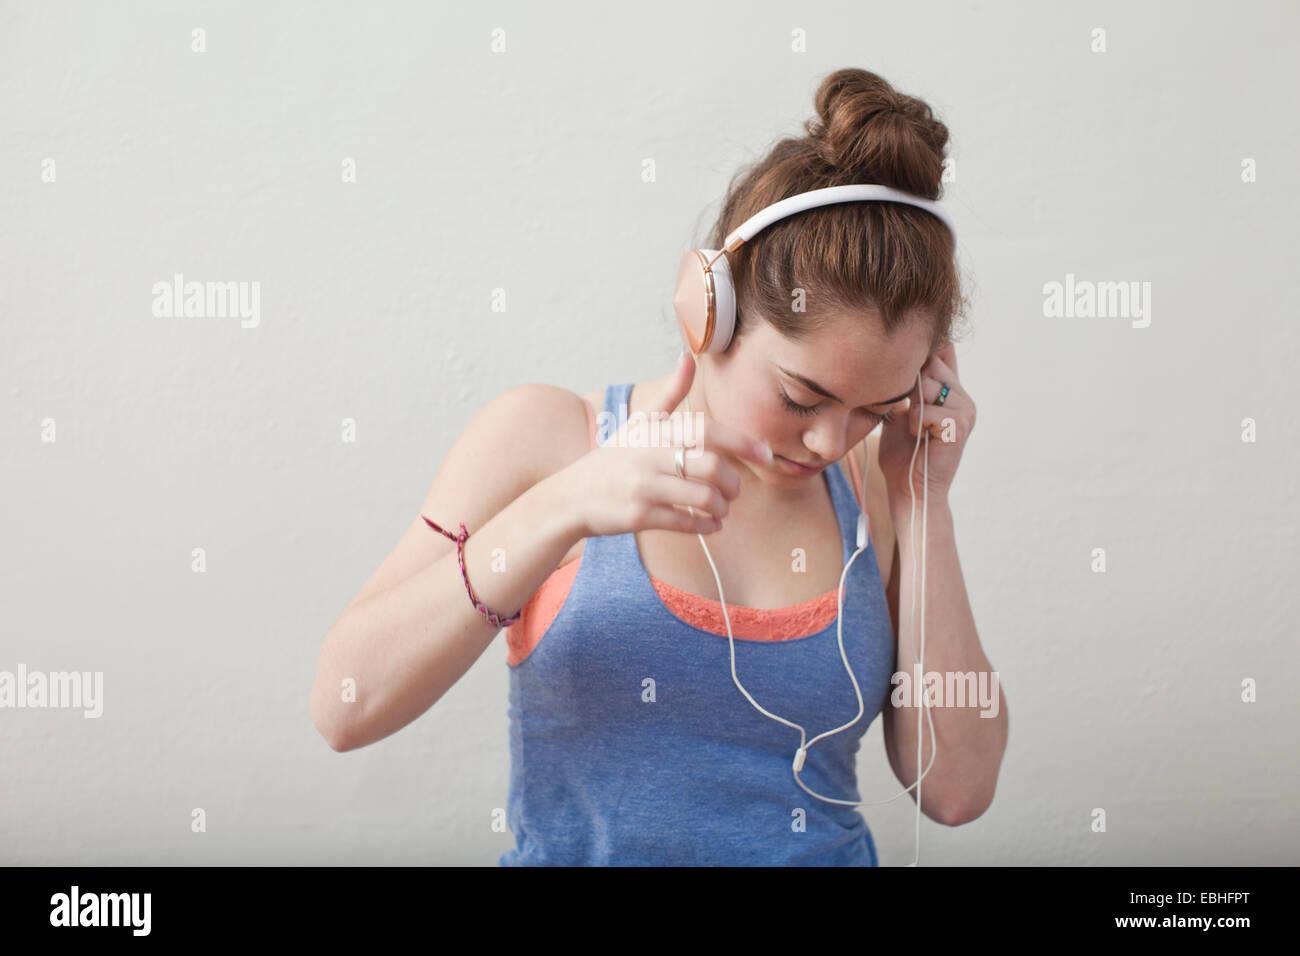 Adolescente escuchando auriculares en ballet school Imagen De Stock